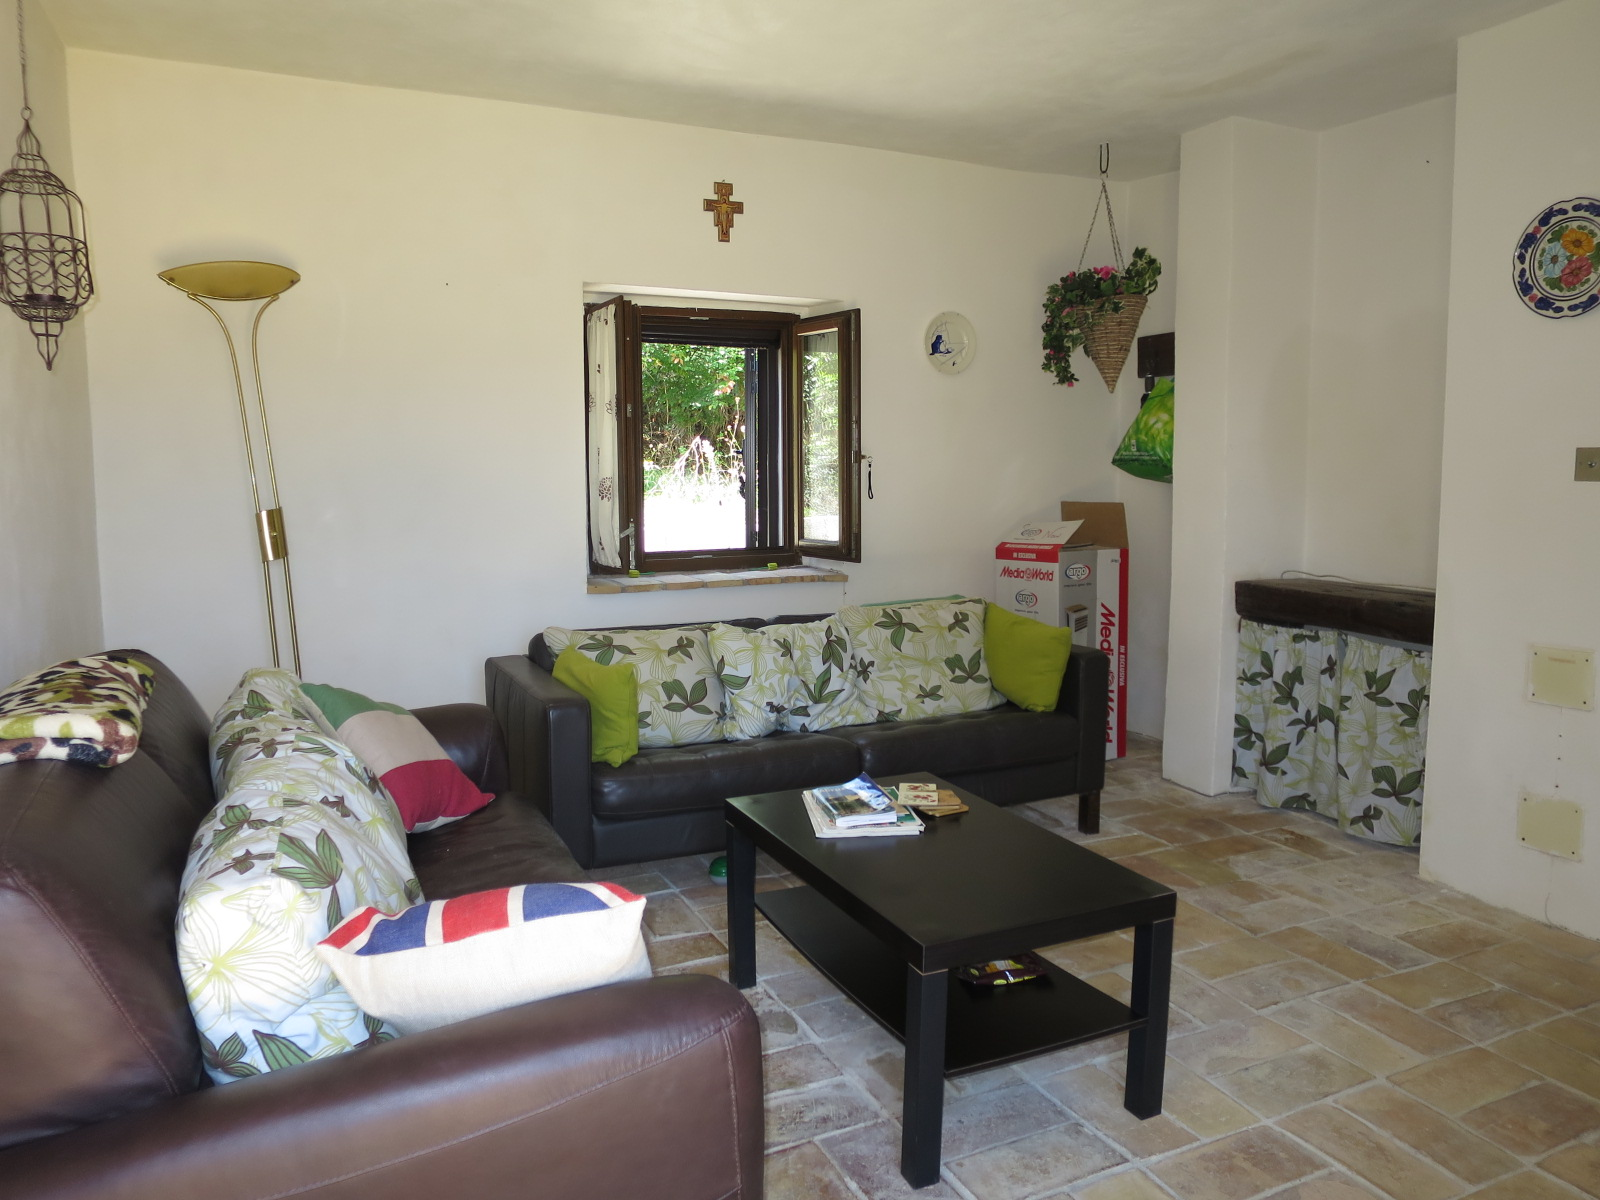 Country Houses Country Houses for sale Montefino (TE), Casa Collina - Montefino - EUR 151.447 320